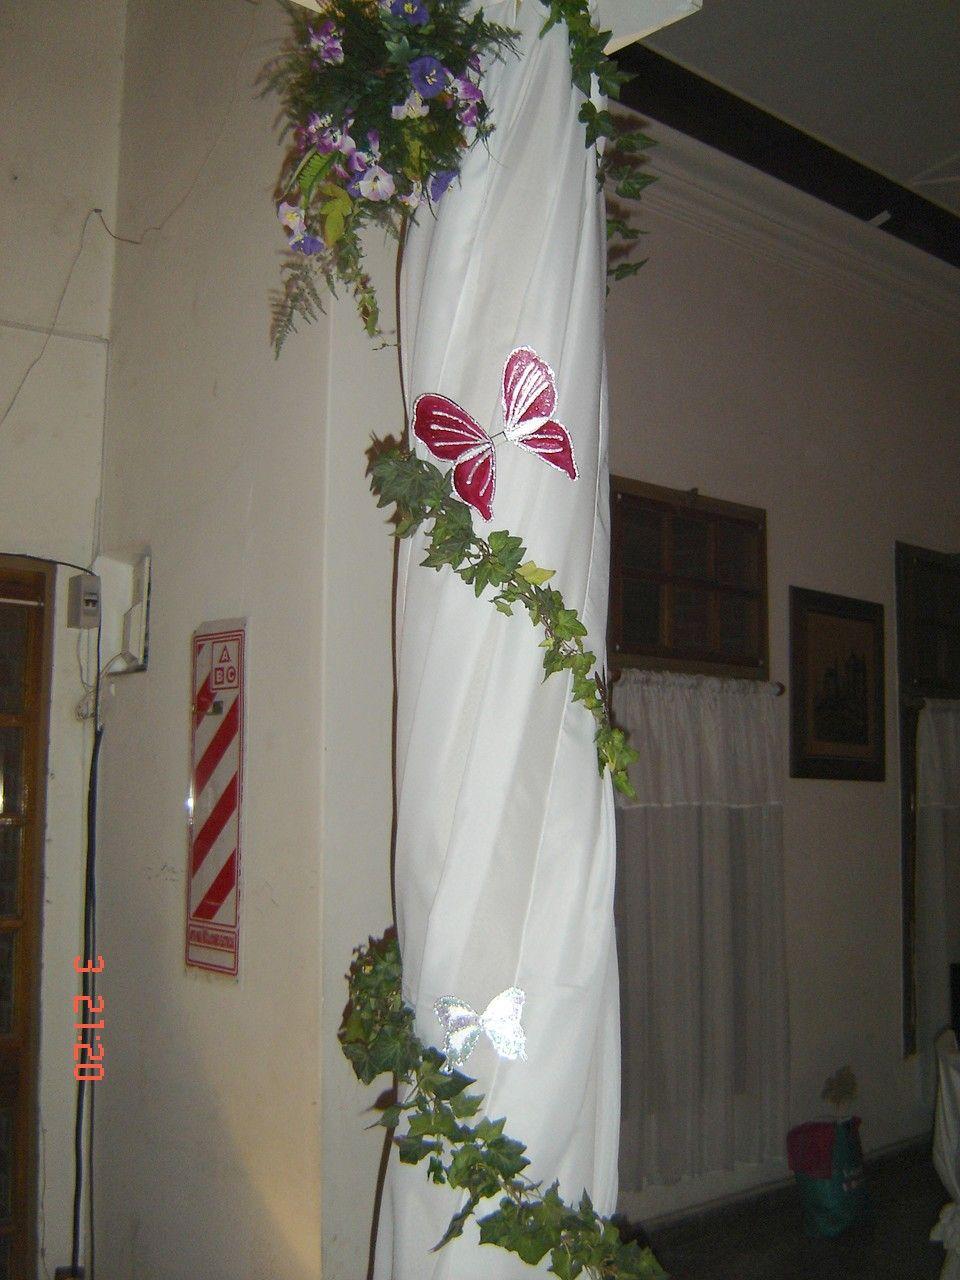 Decoracion salon 15 a os detalle columna planificando fiestas quinceanera wedding y decor - Decoracion columnas salon ...